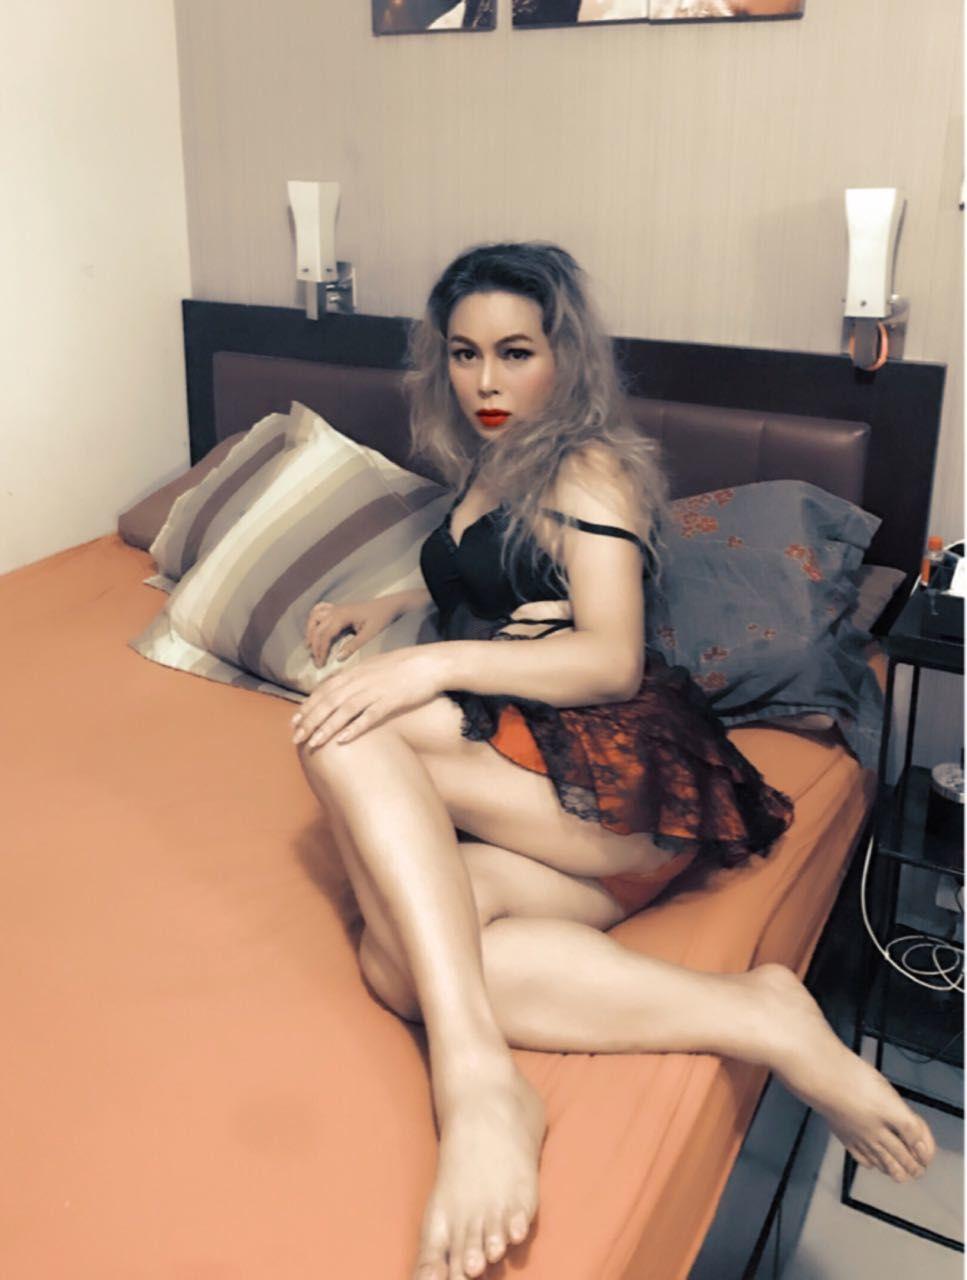 Get Indonesia Femdom Pic Porn For Free - Wwwxxx-Video -7618